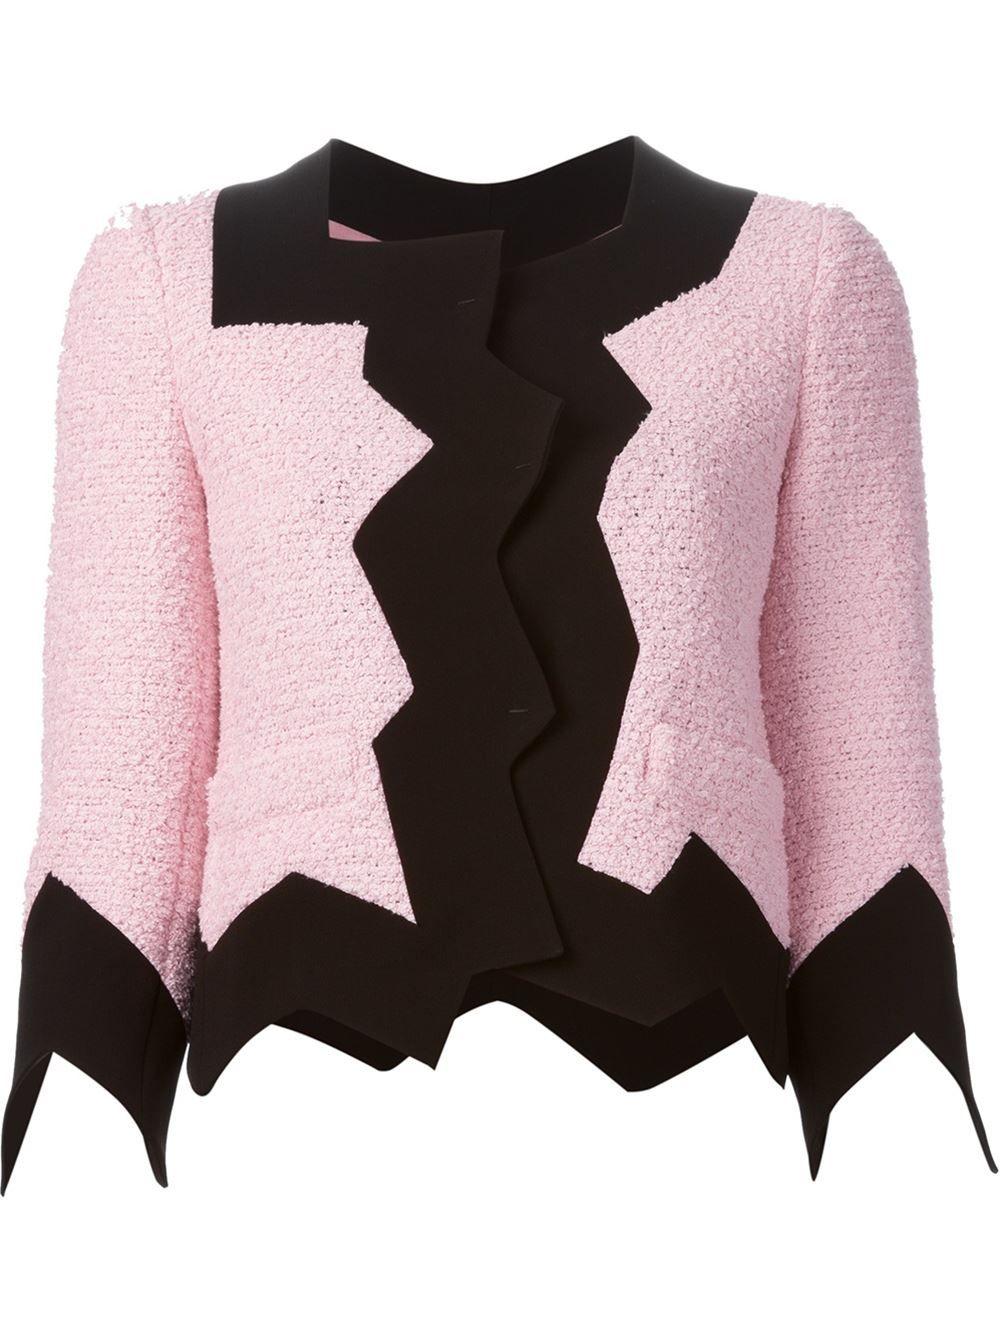 Boutique Moschino | Black Jagged Trim Bouclé Jacket | Lyst